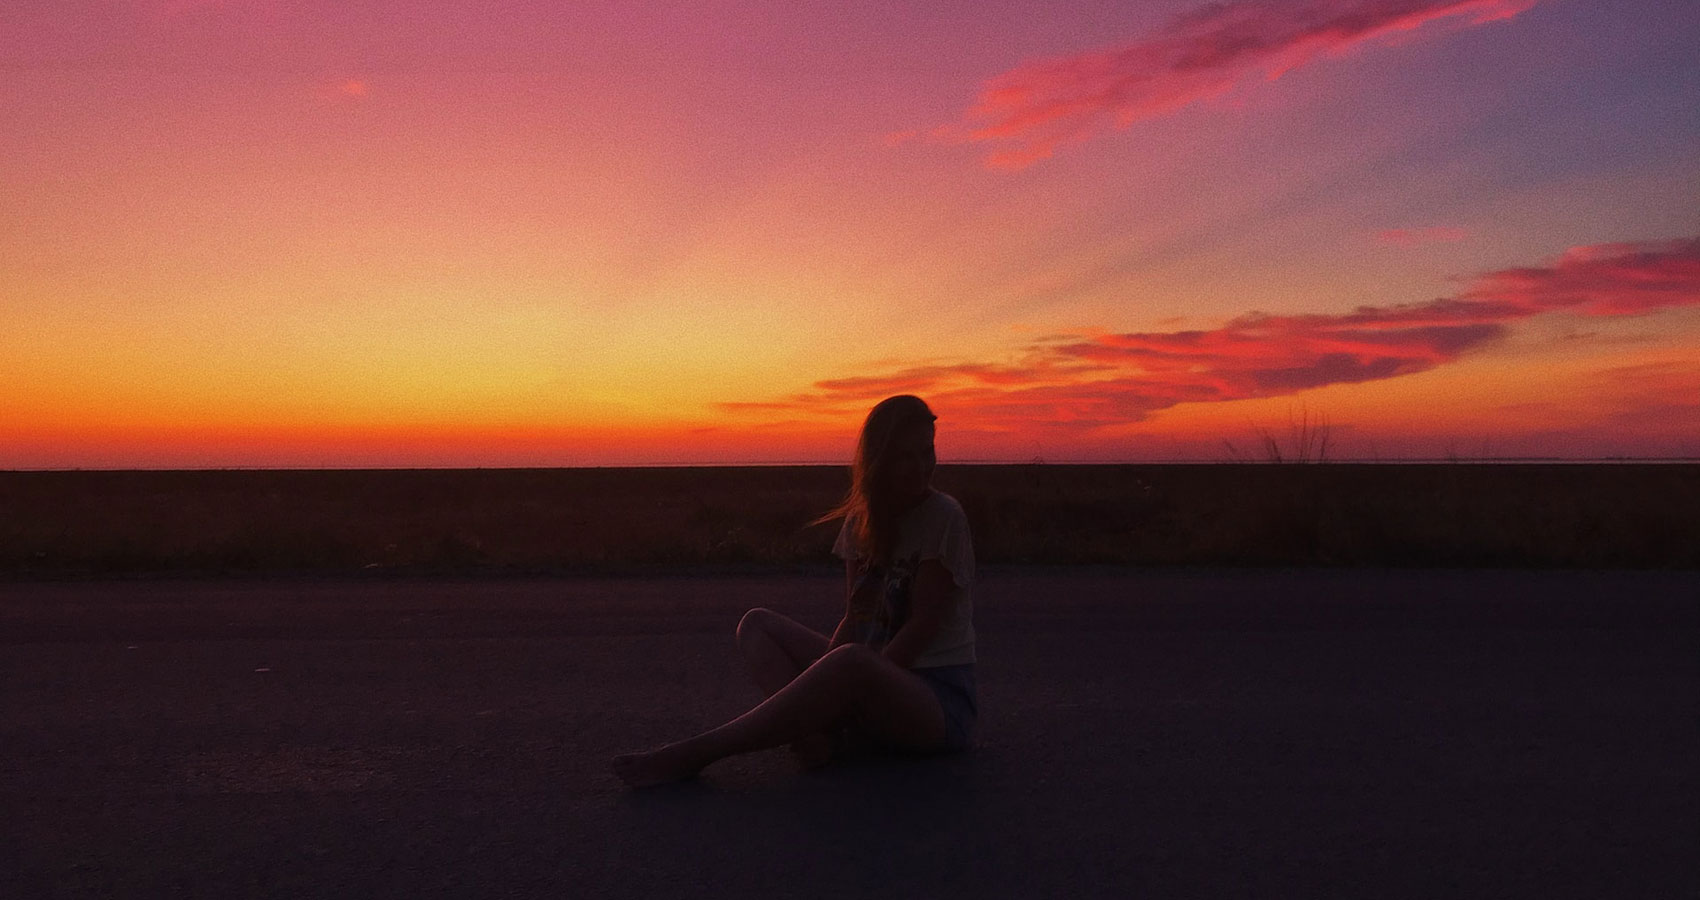 Always Darkest Before Dawn, a poem by Amanda Steel at Spillwords.com